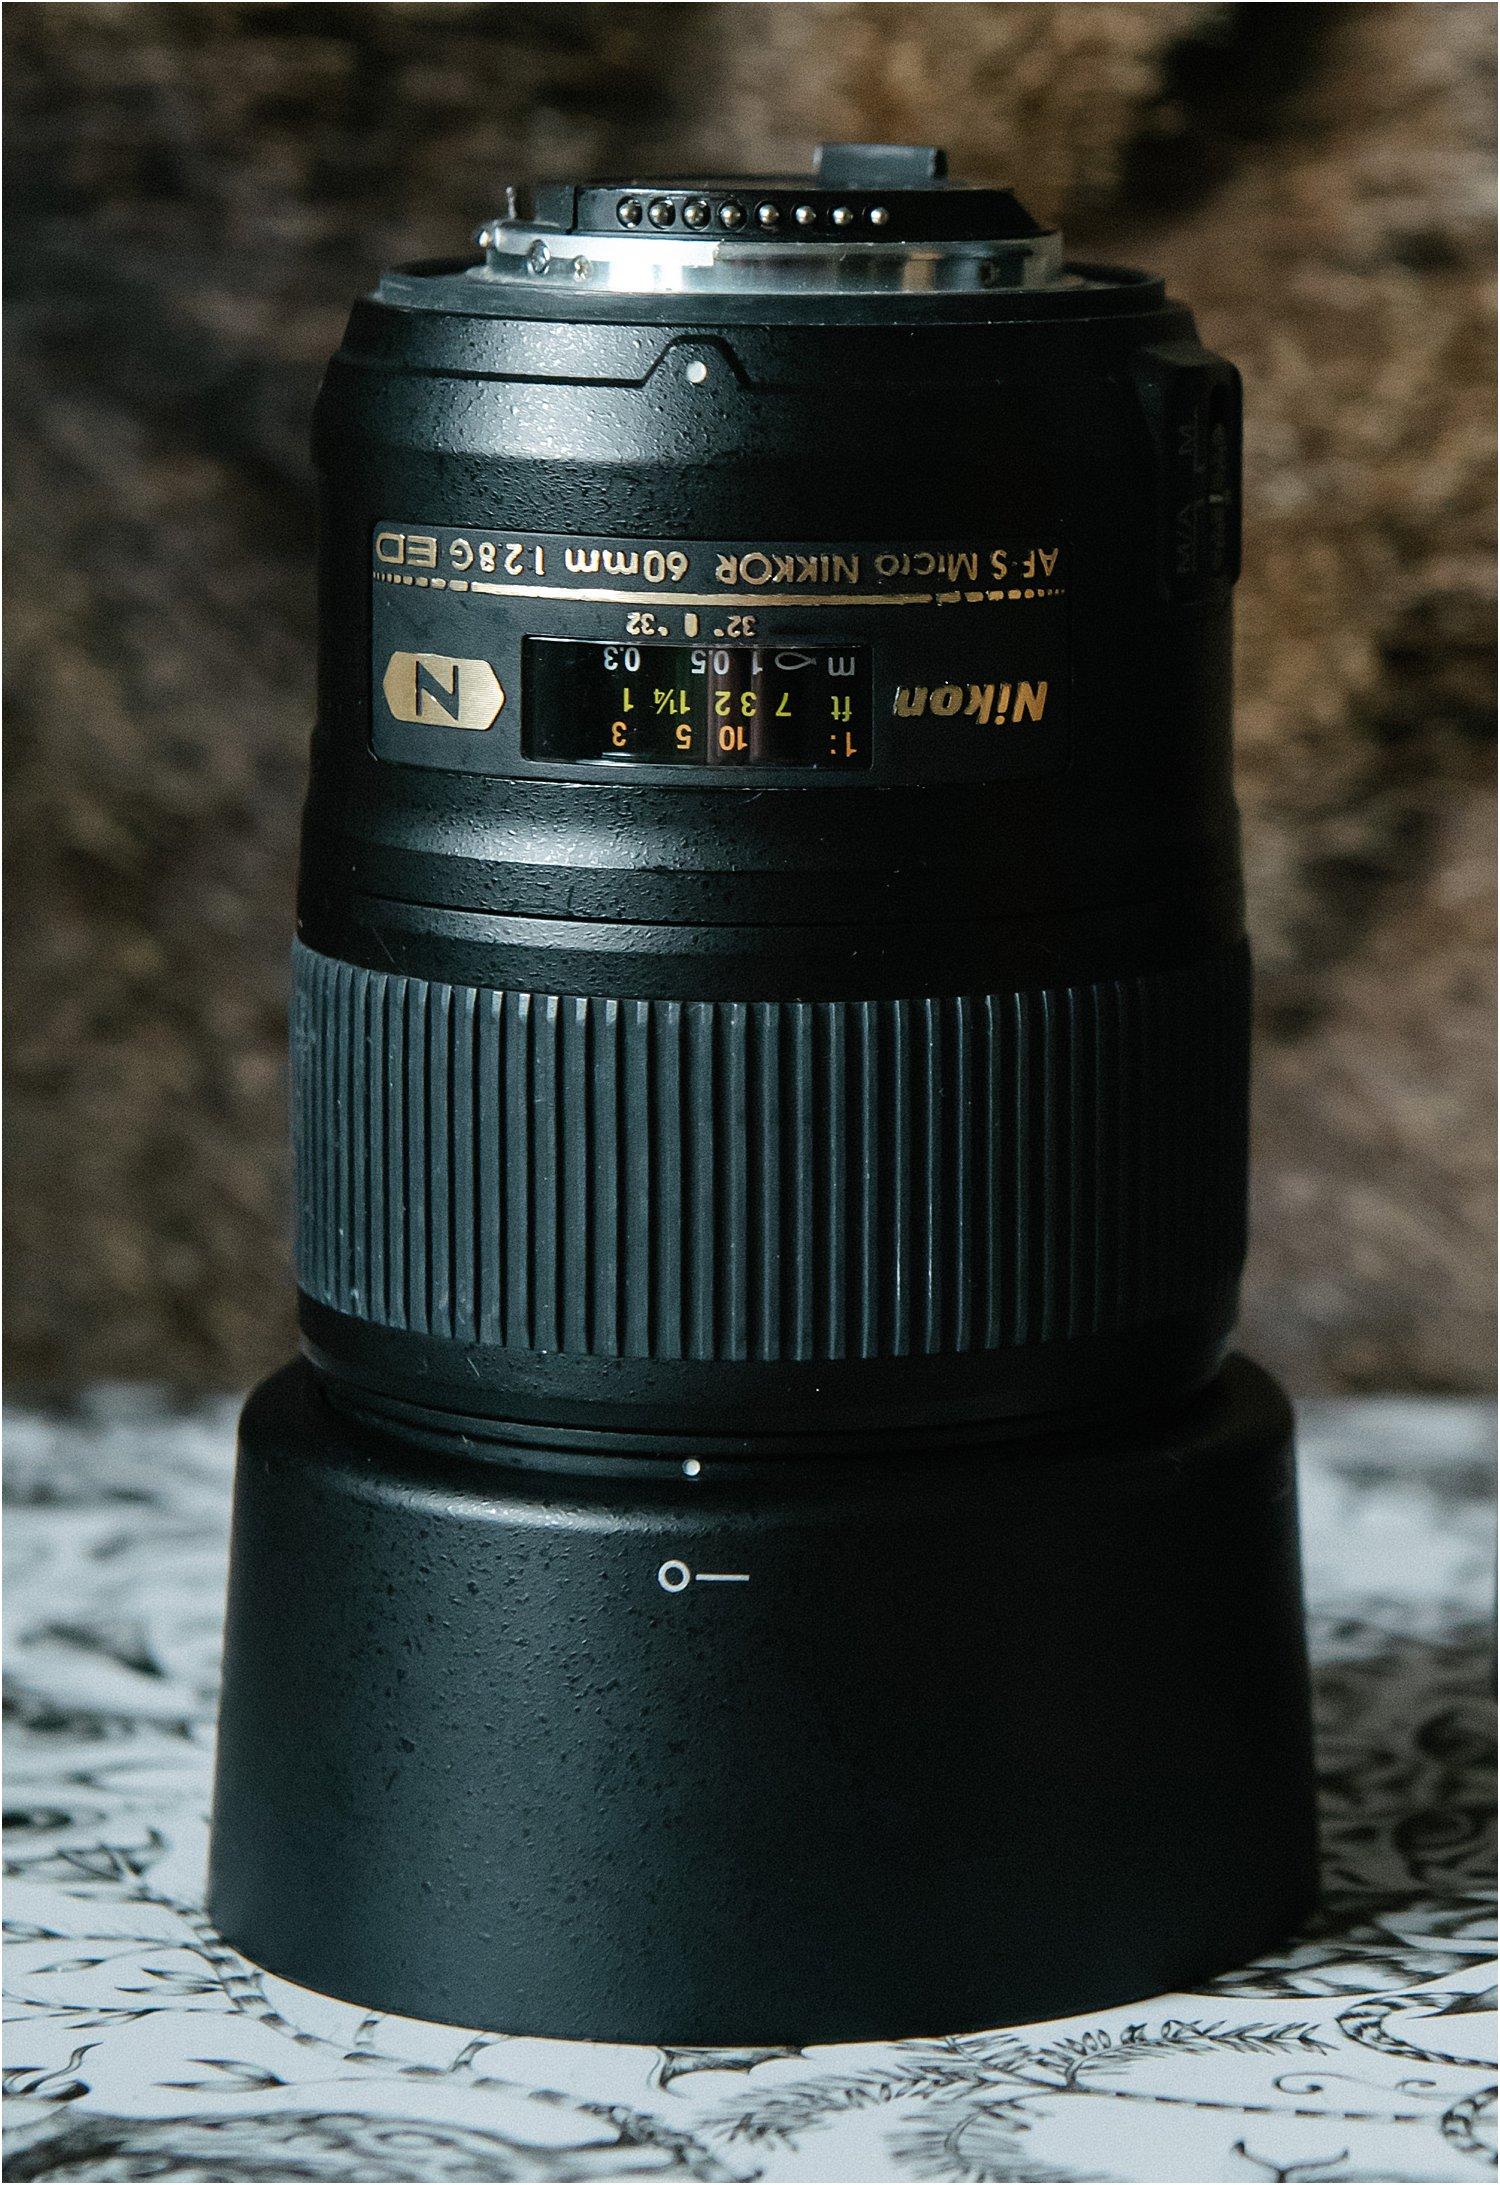 dps-3-tips-capturing-holiday-nikkor-60mm-micro-macro-lily-sawyer-photo